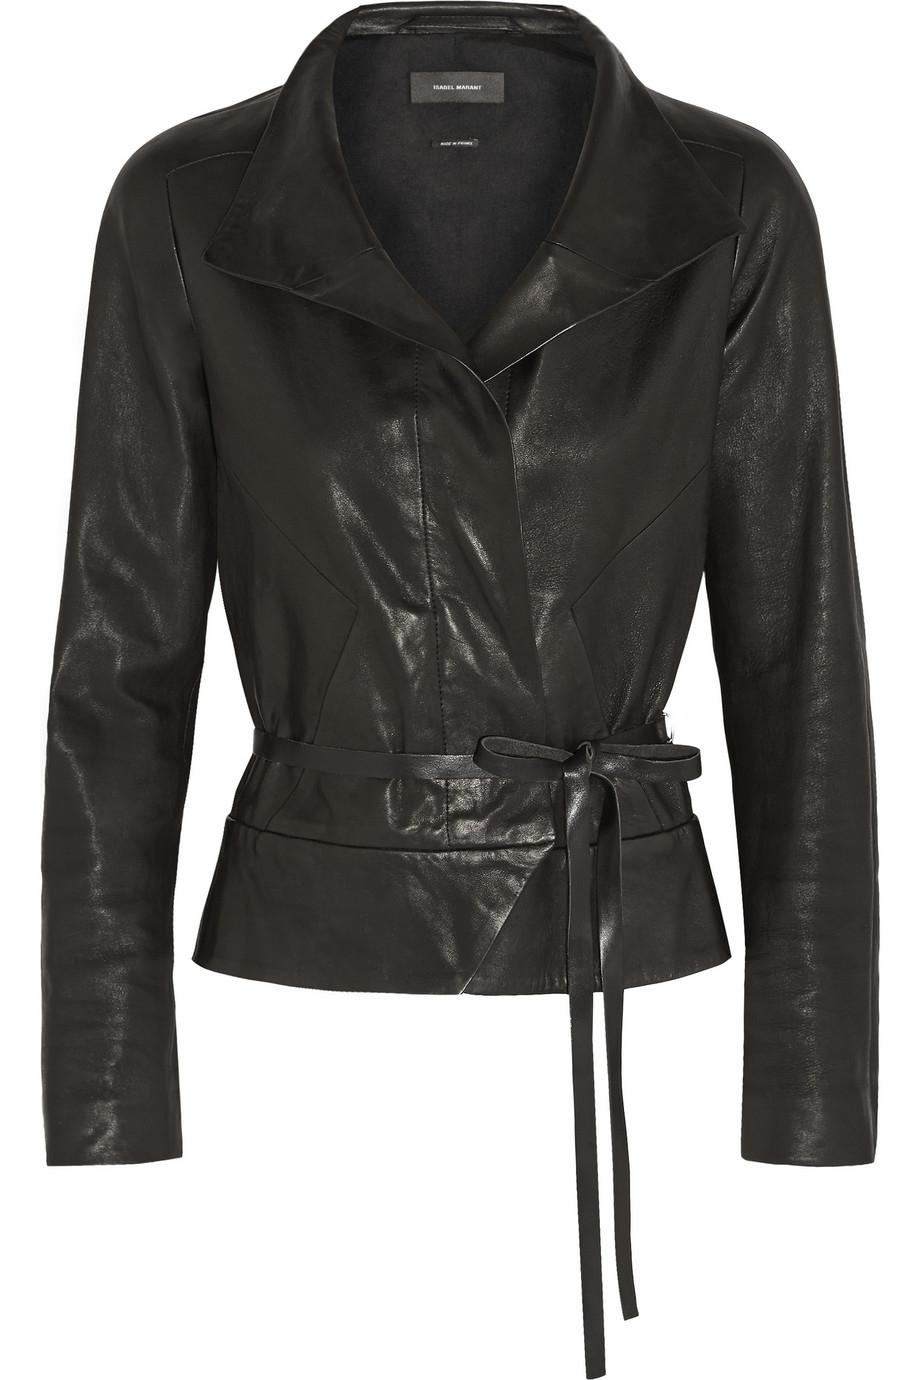 Shop for leather jackets at kumau.ml Free kumau.ml: Sam Edelman, Topshop, Vince Camuto, Free People, KUT, Mackage, Halogen, Caslon.